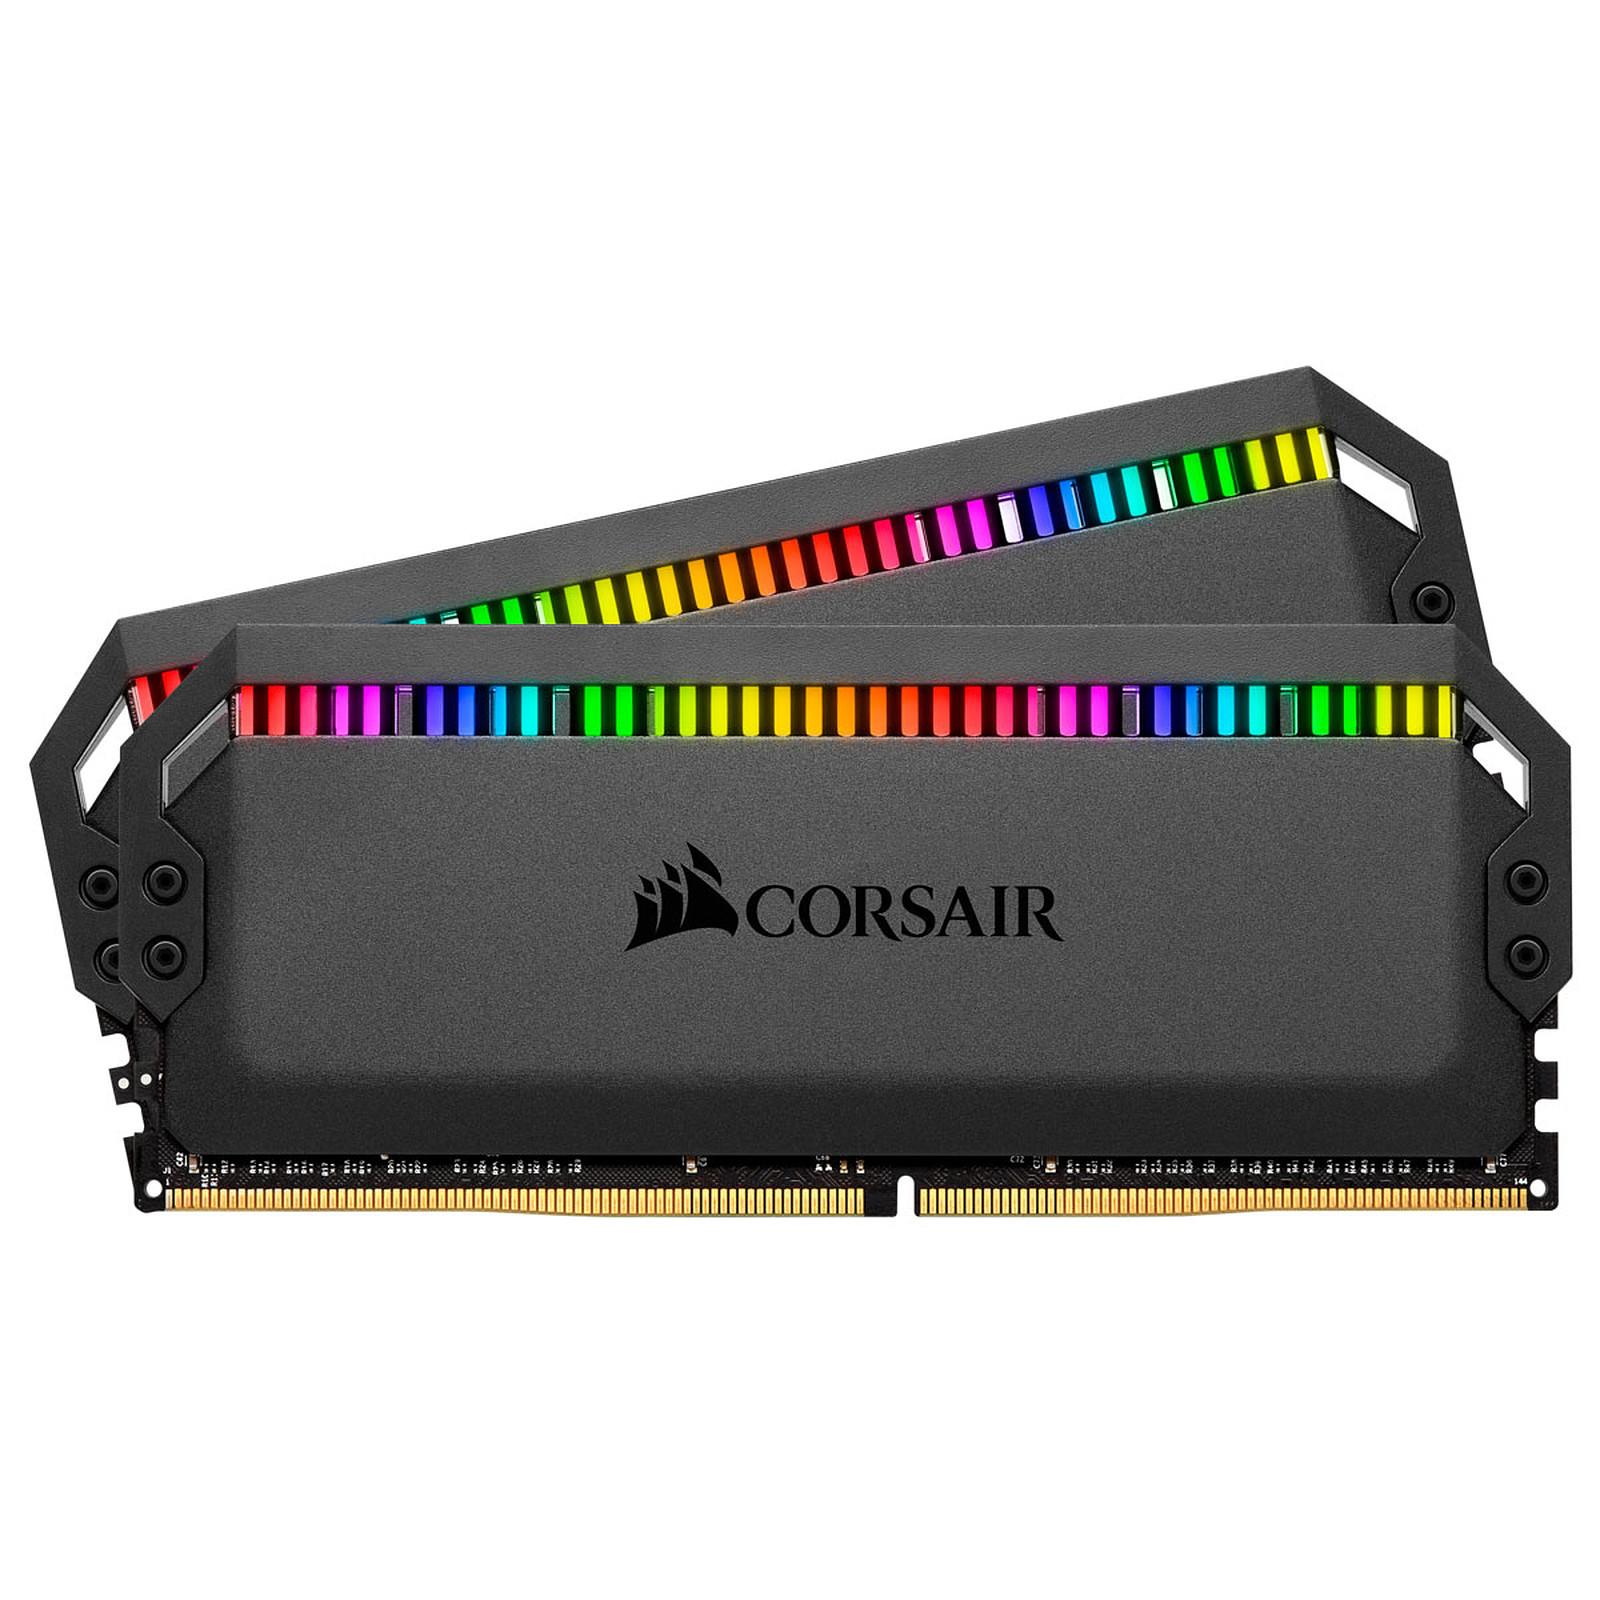 Corsair Dominator Platinum RGB 16 Go (2x 8Go) DDR4 4266 MHz CL19